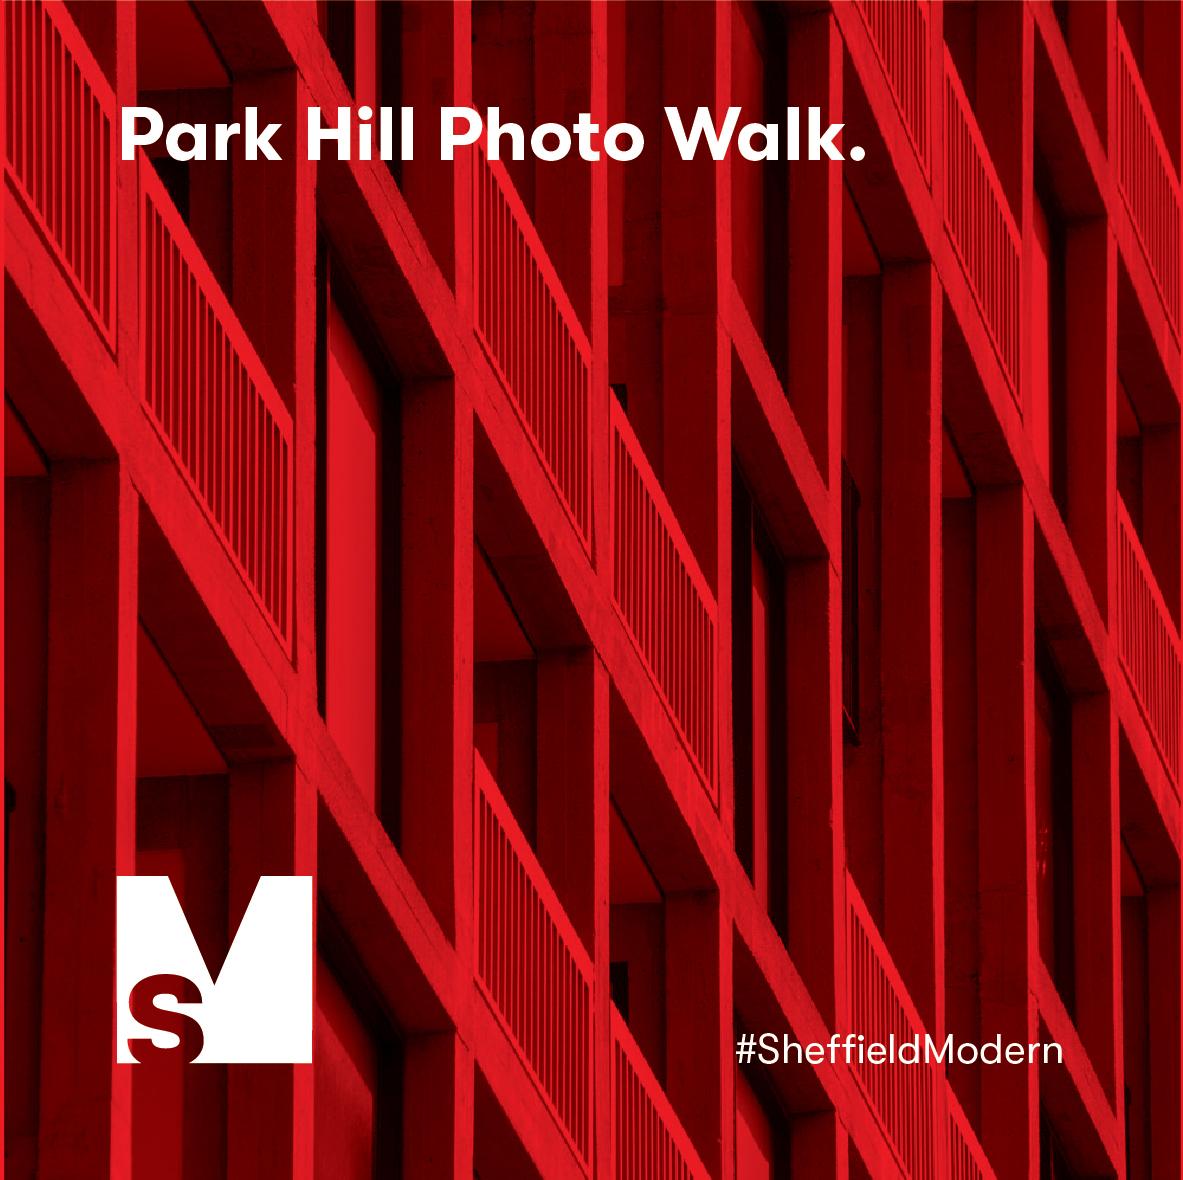 sheff park hill photo.jpg